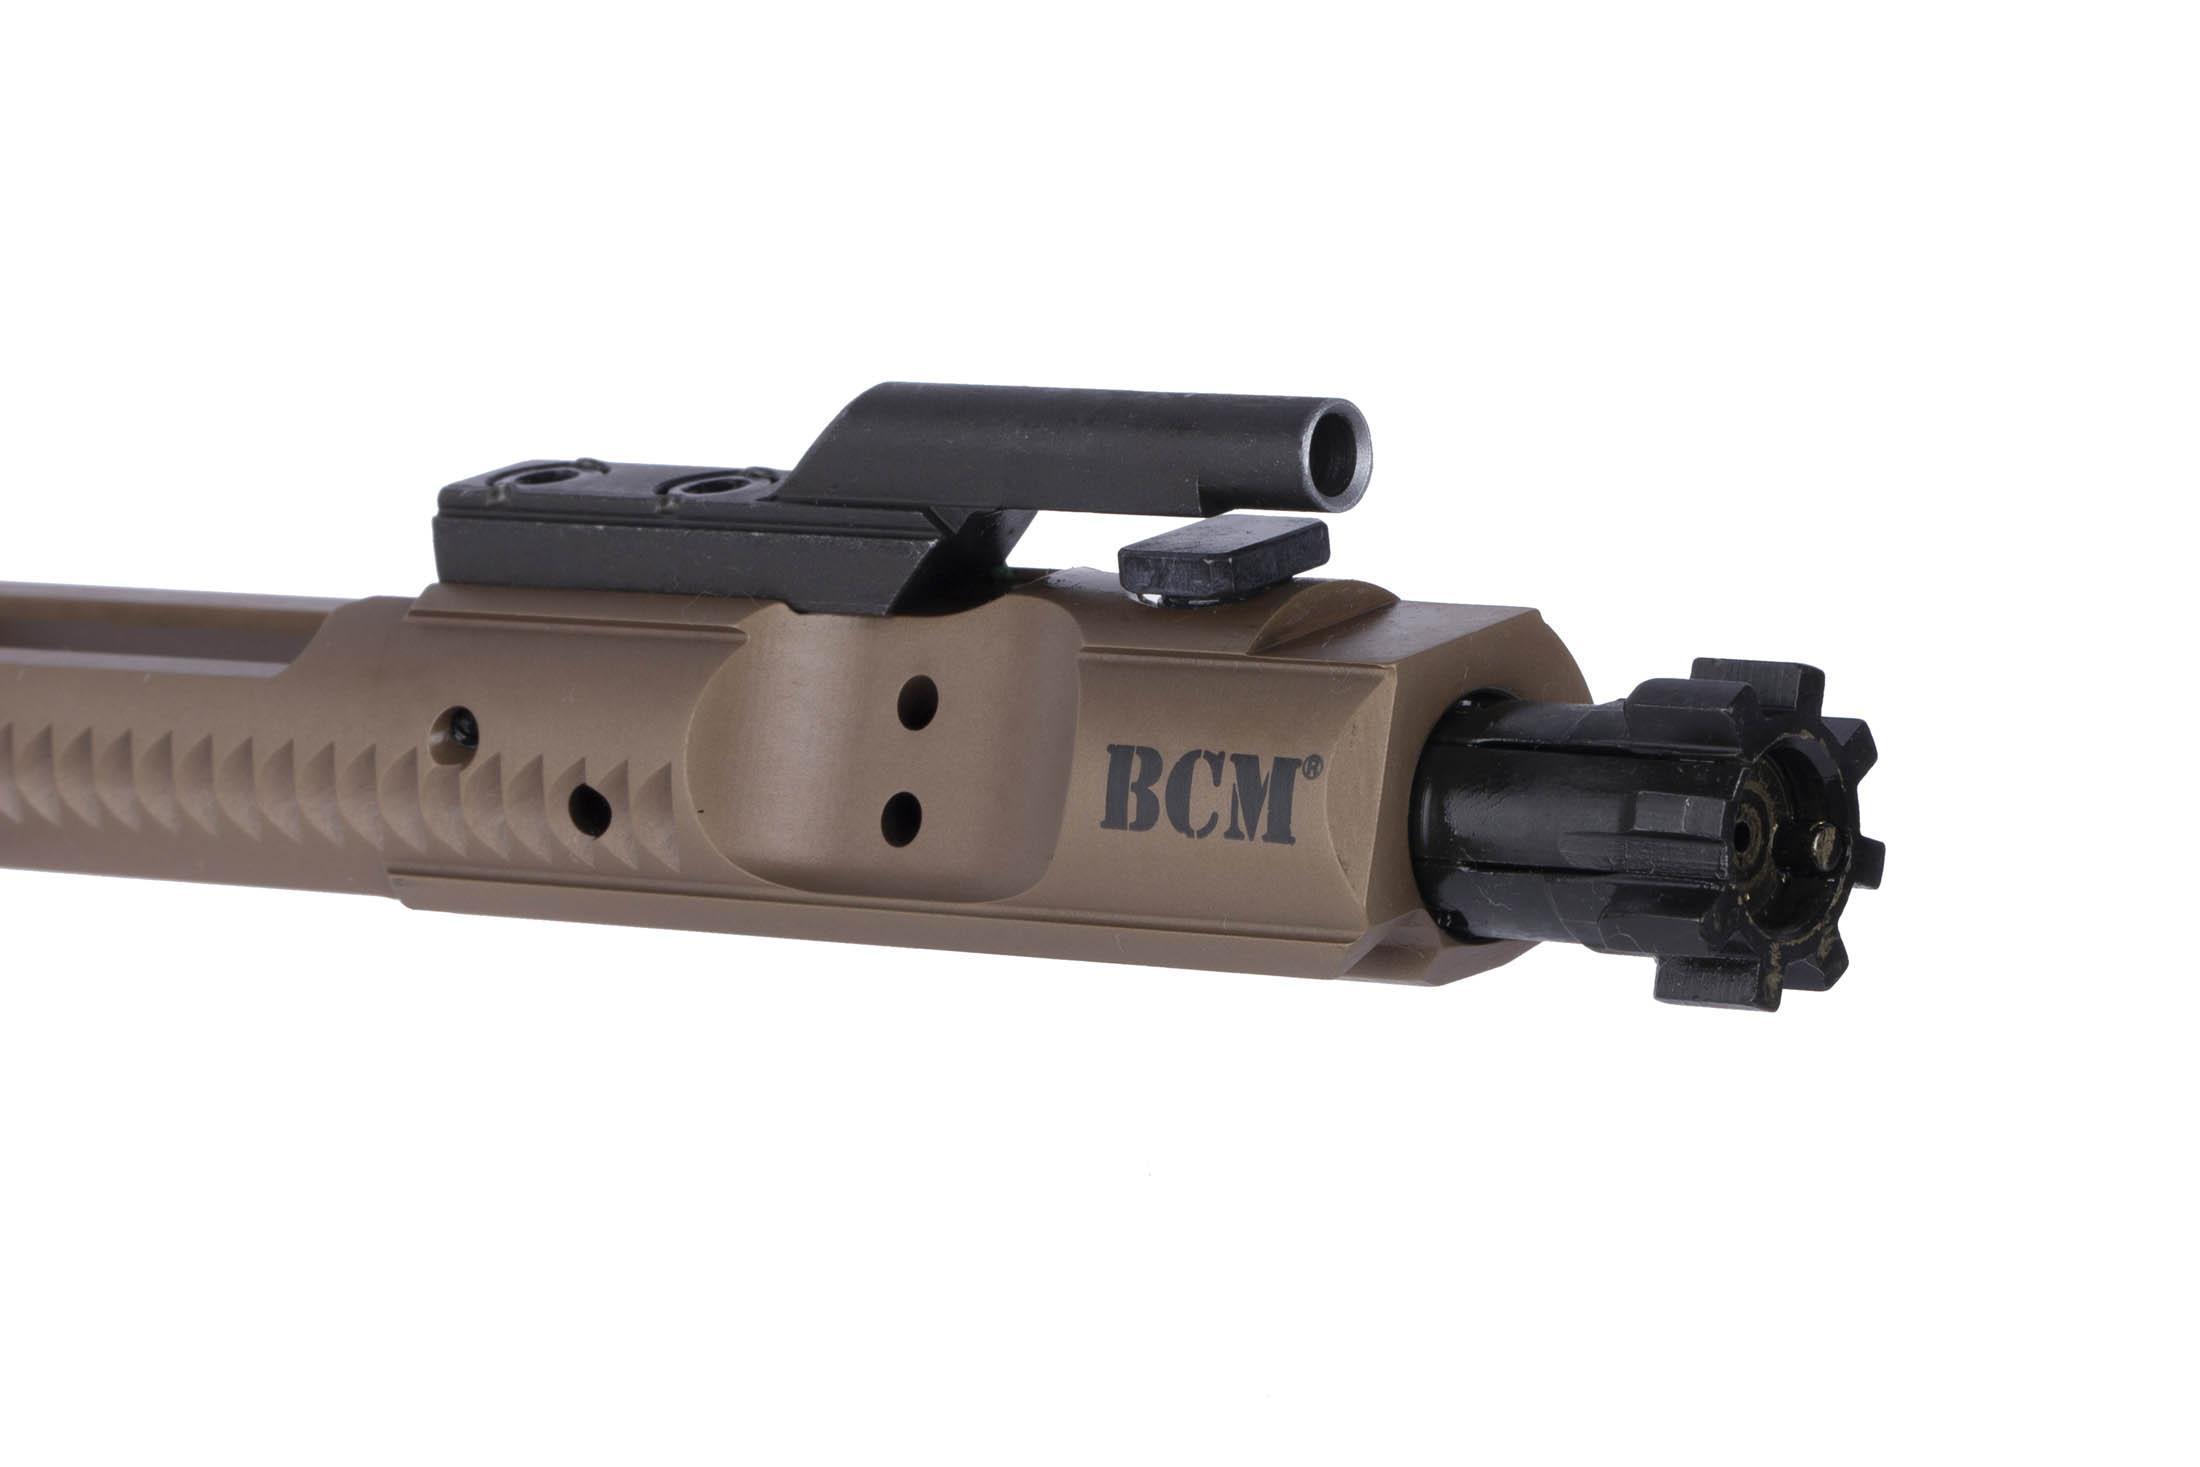 Bravo Company Manufacturing AR-15 Bolt Carrier Group - IonBond Flat Dark  Earth